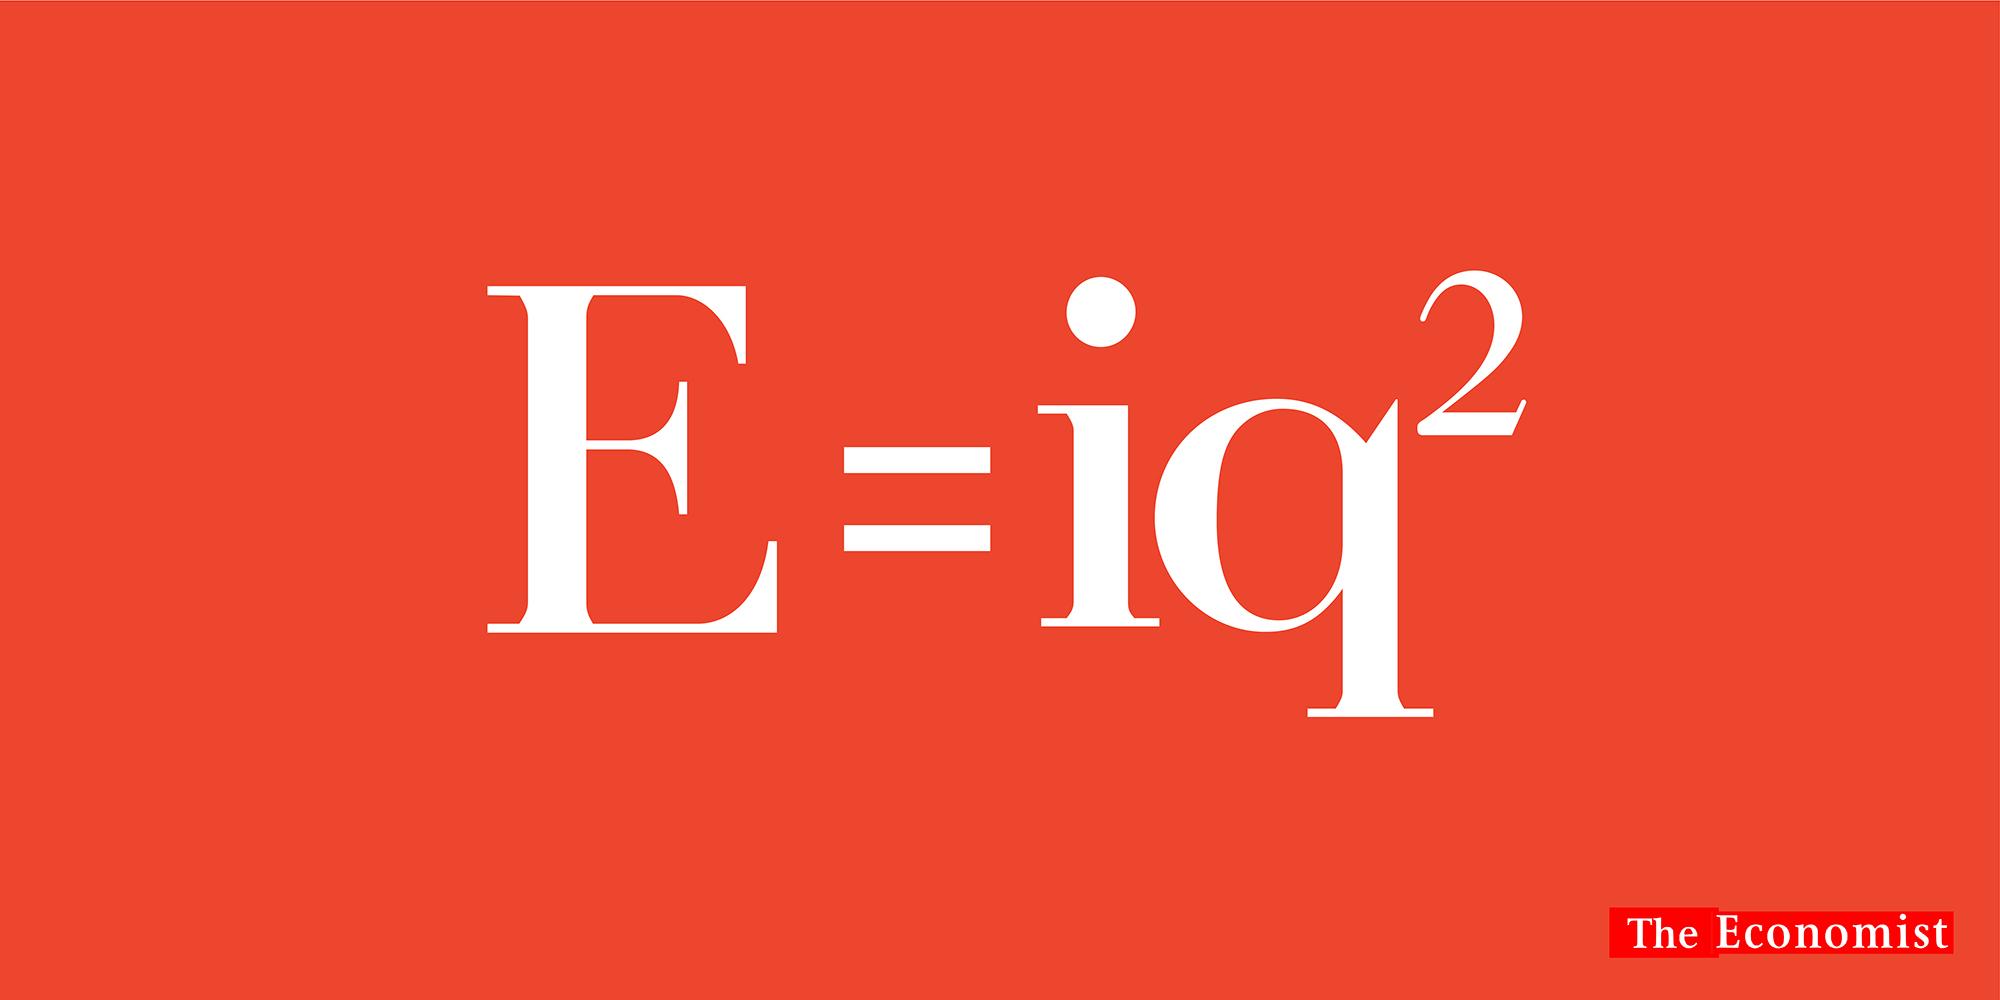 'E=iq2' The Economist, Dave Dye, AMV_BBDO